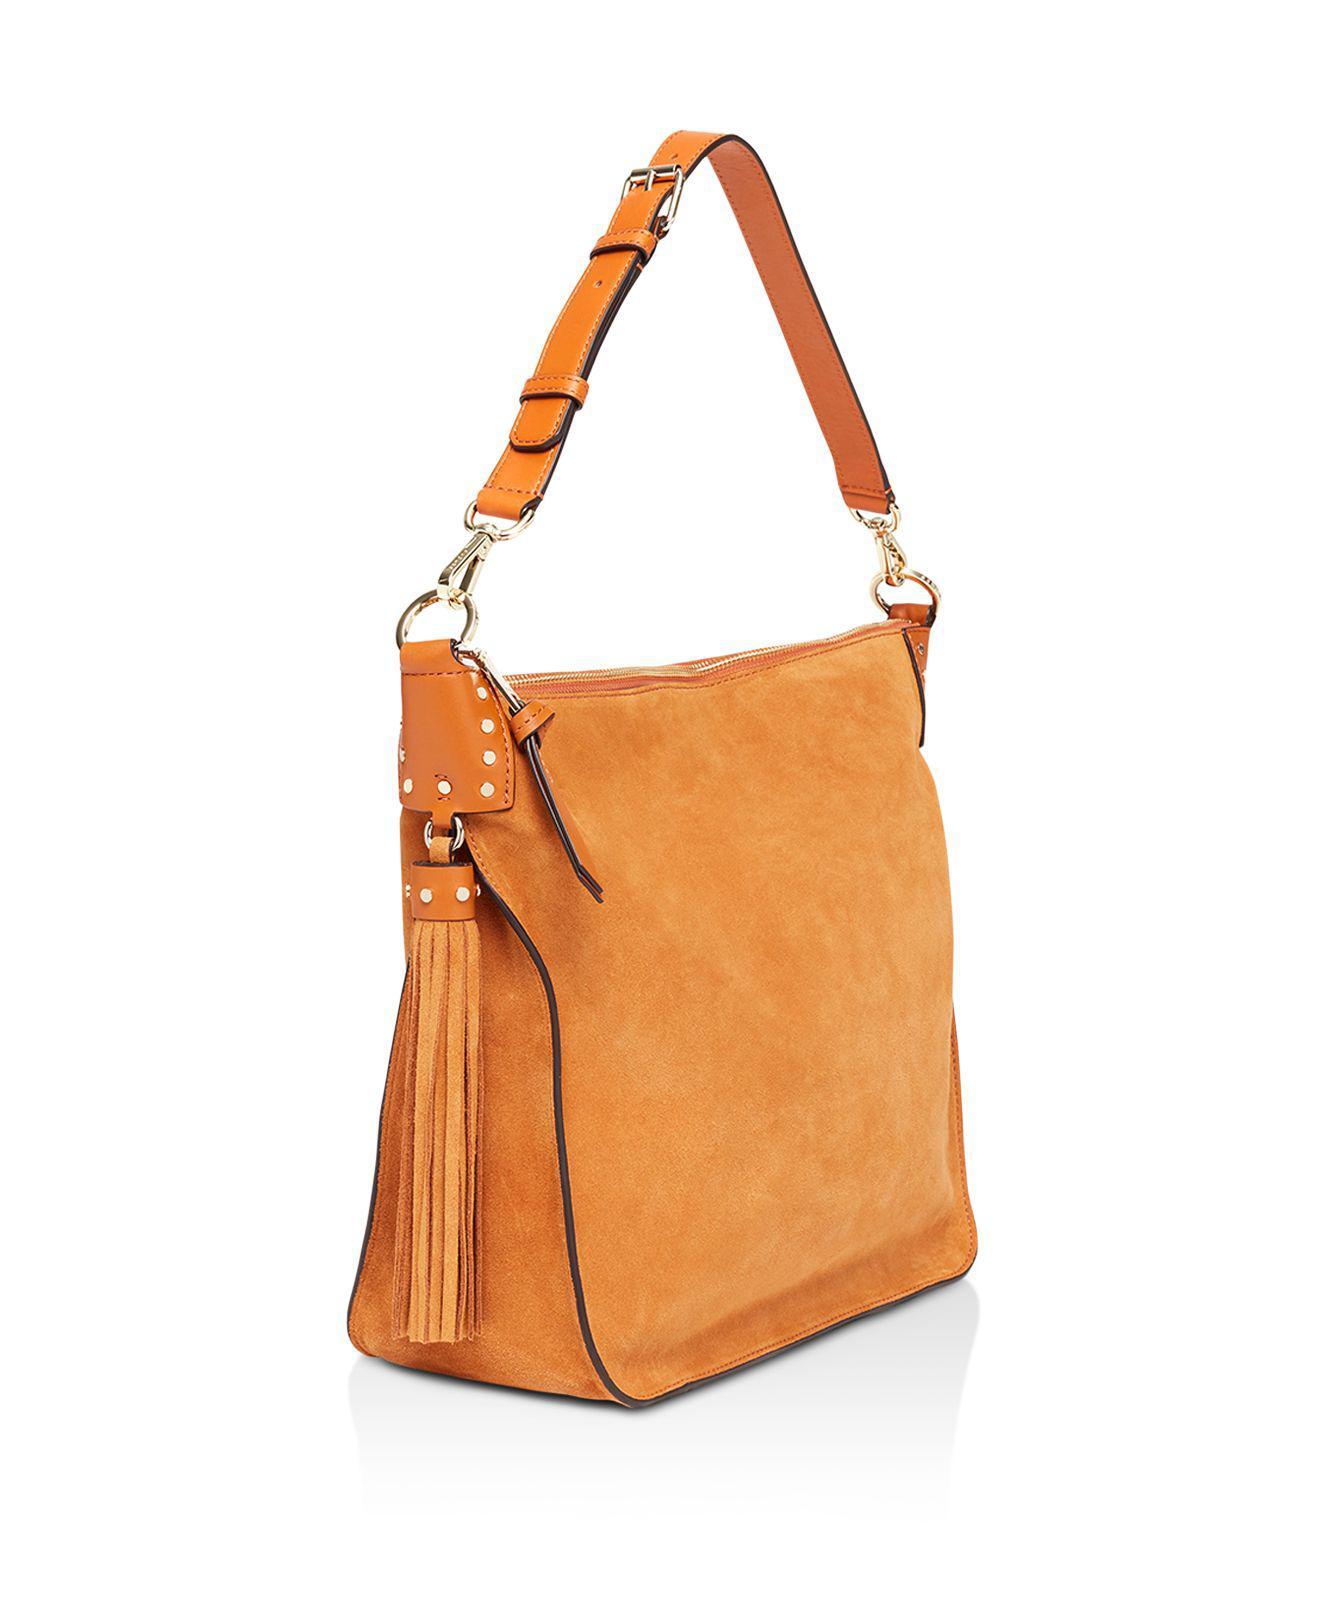 Cheapest For Sale Sandro Masha Suede Shoulder Bag Best Place bkAGNXhz